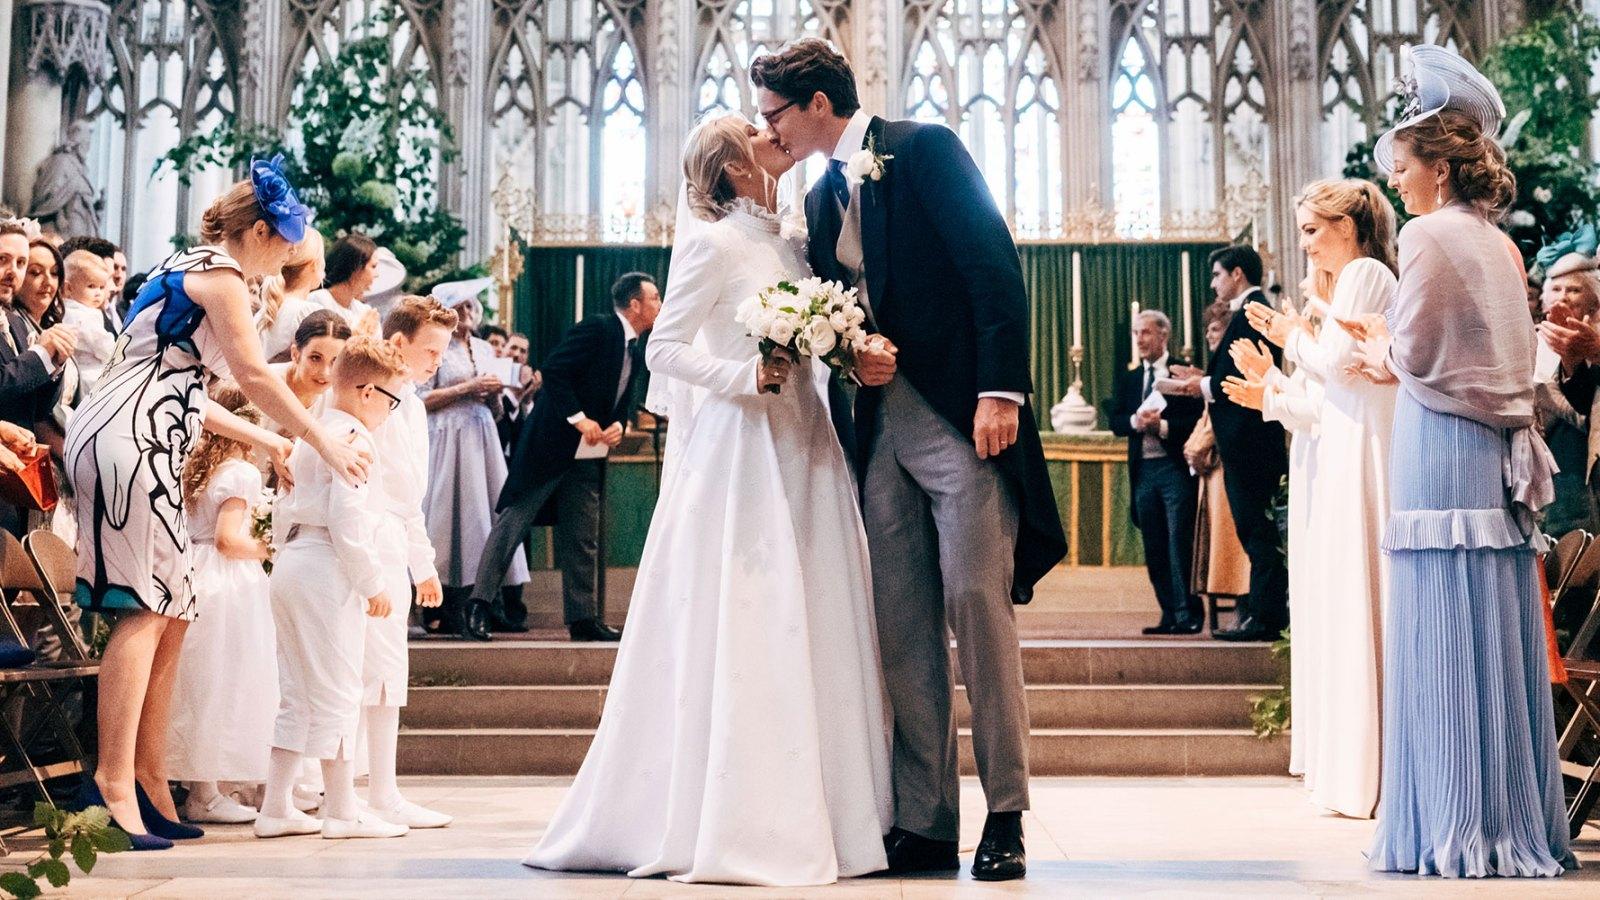 May 7 2006 When Tori Spelling Married Dean Mcdermott They Snuck